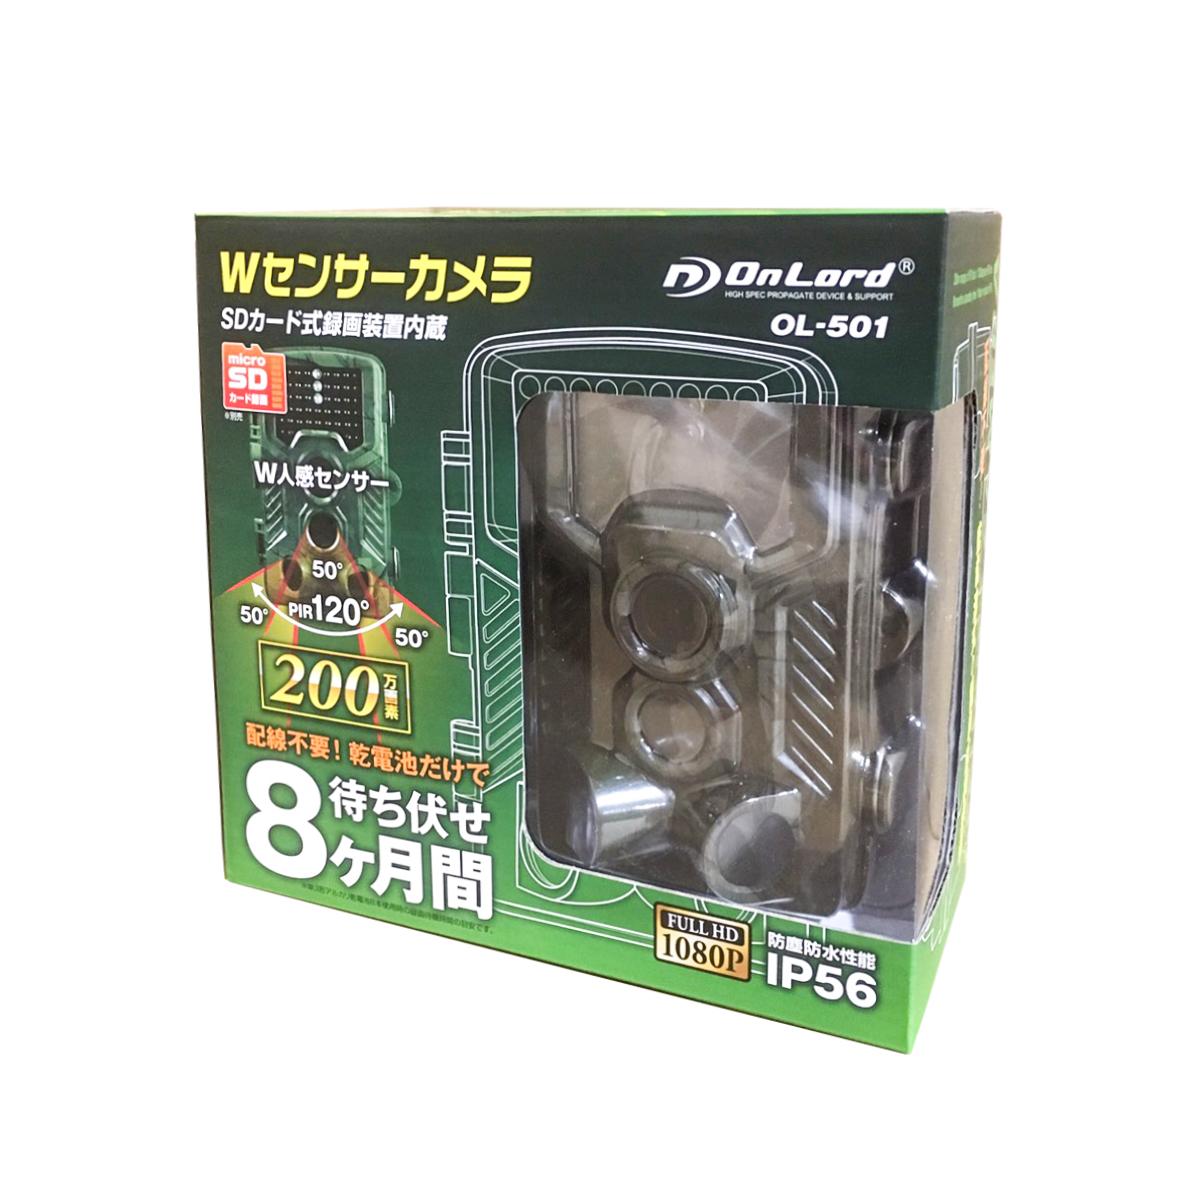 Wセンサーカメラ 防犯カメラ SDカード式録画装置内蔵 オンロード OnLord